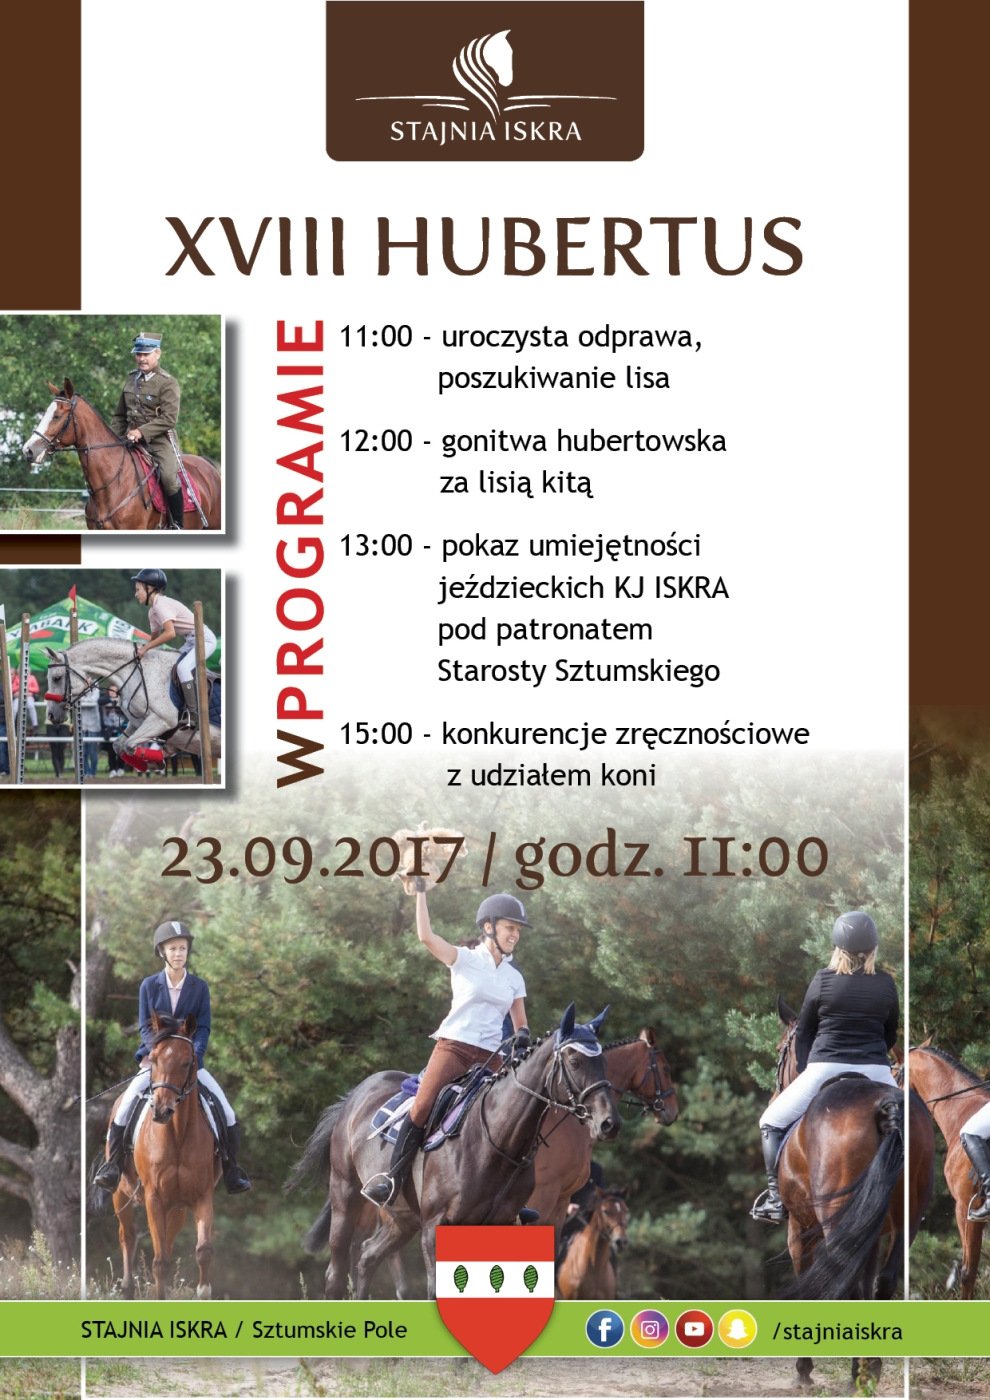 http://m.82-200.pl/2017/09/orig/plakat-xviii-hubertus-1684.jpg